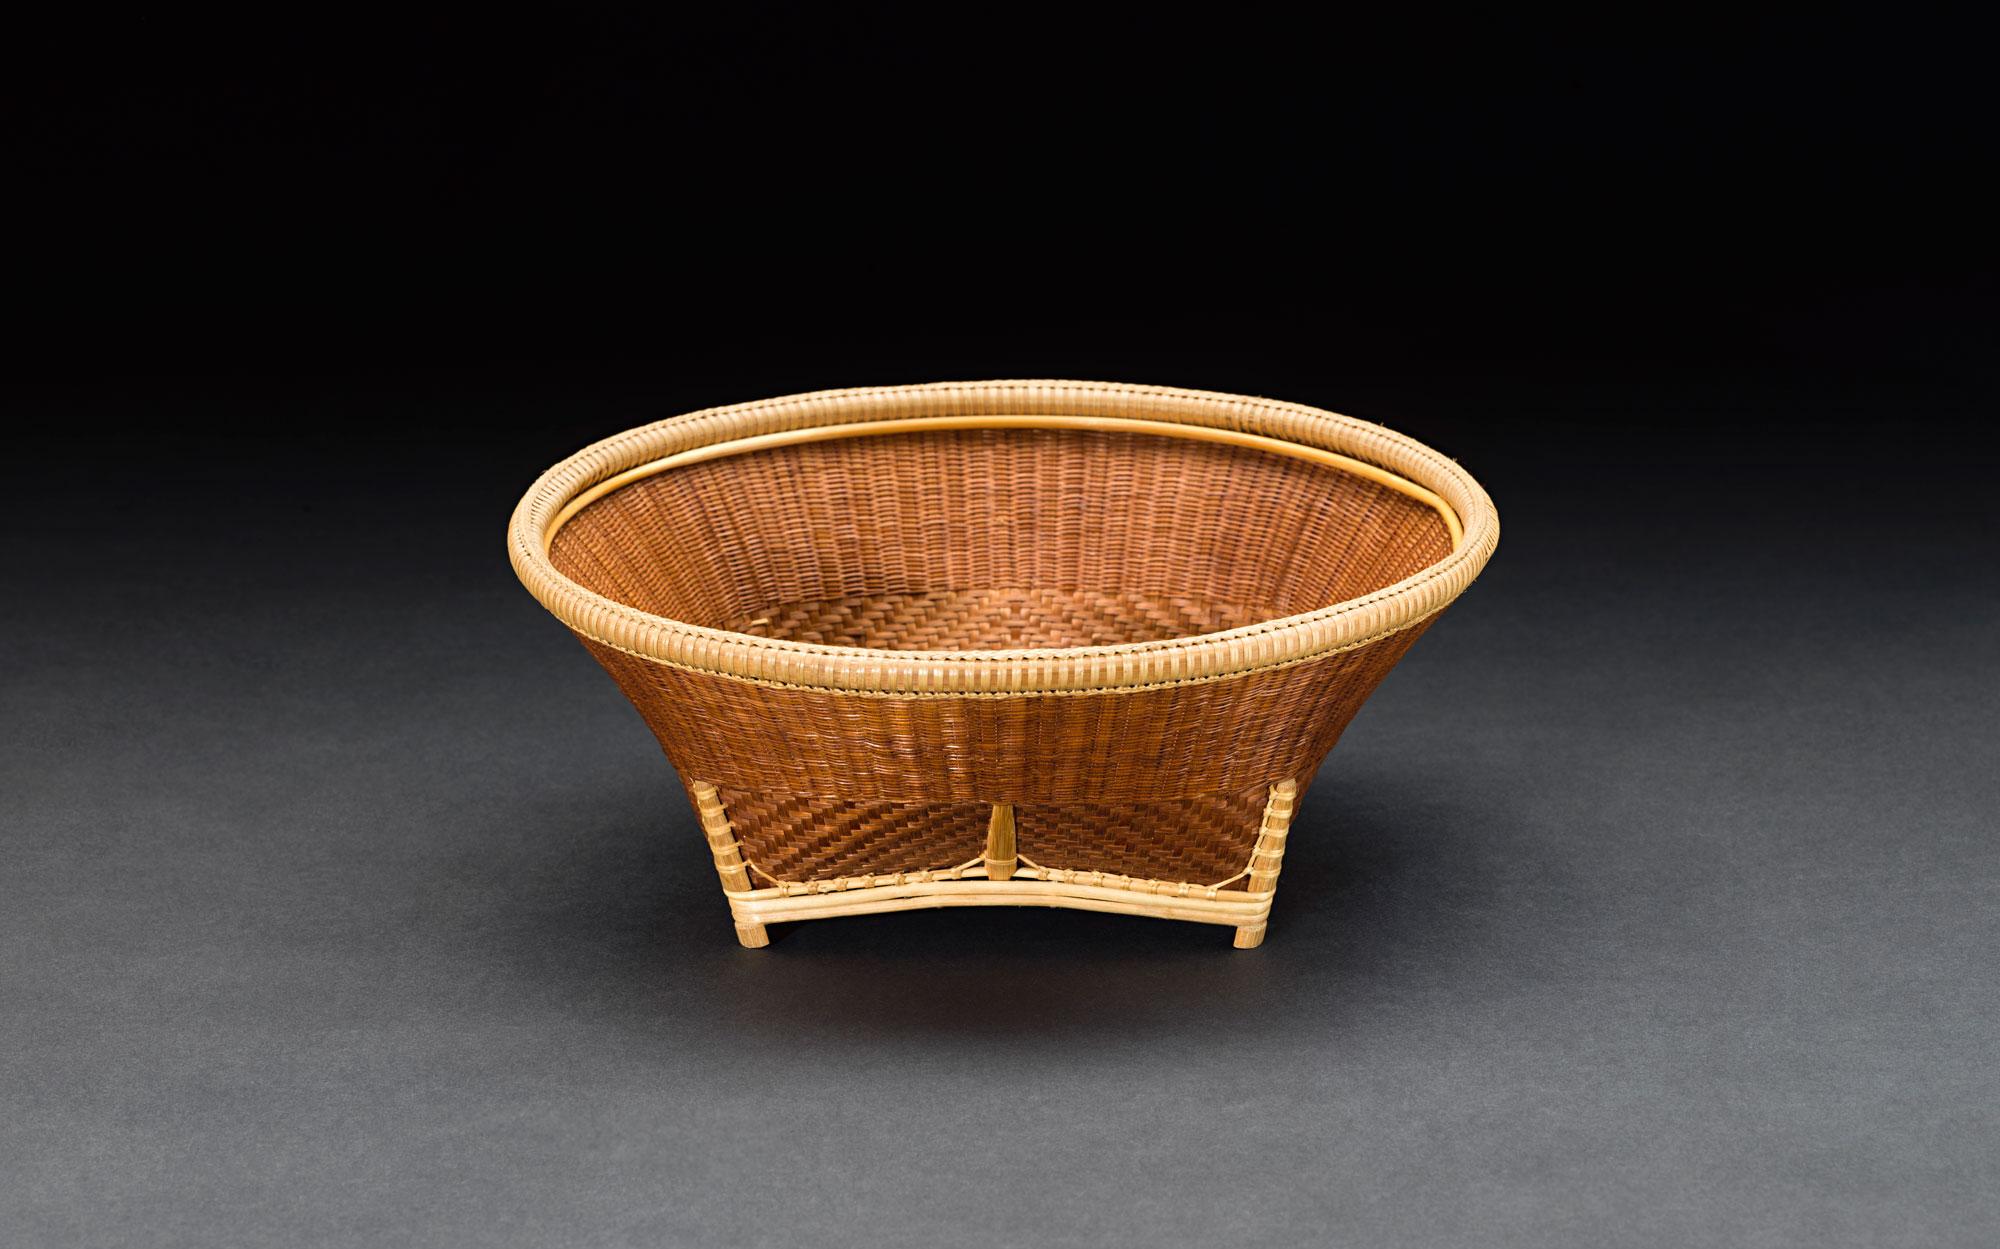 Basketry Set Pho Thong District, Ang Thong Province  Gift from the SUPPORT Foundation to the Smithsonian Institution, 1981 Courtesy of the Smithsonian Institution, Department of Anthropology; E421961-0, E421962-0, E421964-0; Photo by Jim Di Loreto  ชุดตะกร้าสาน อำเภอโพธิ์ทอง จังหวัดอ่างทอง ของขวัญจากมูลนิธิส่งเสริมศิลปาชีพในสมเด็จพระนางเจ้าสิริกิติ์ พระบรมราชินีนาถ มอบให้สถาบันสมิธโซเนียน พ.ศ. ๒๕๒๔ ได้รับความอนุเคราะห์จากฝ่ายมานุษยวิทยา สถาบันสมิธโซเนียน; E421964-0; ถ่ายโดย จิม ดิลอเรโต